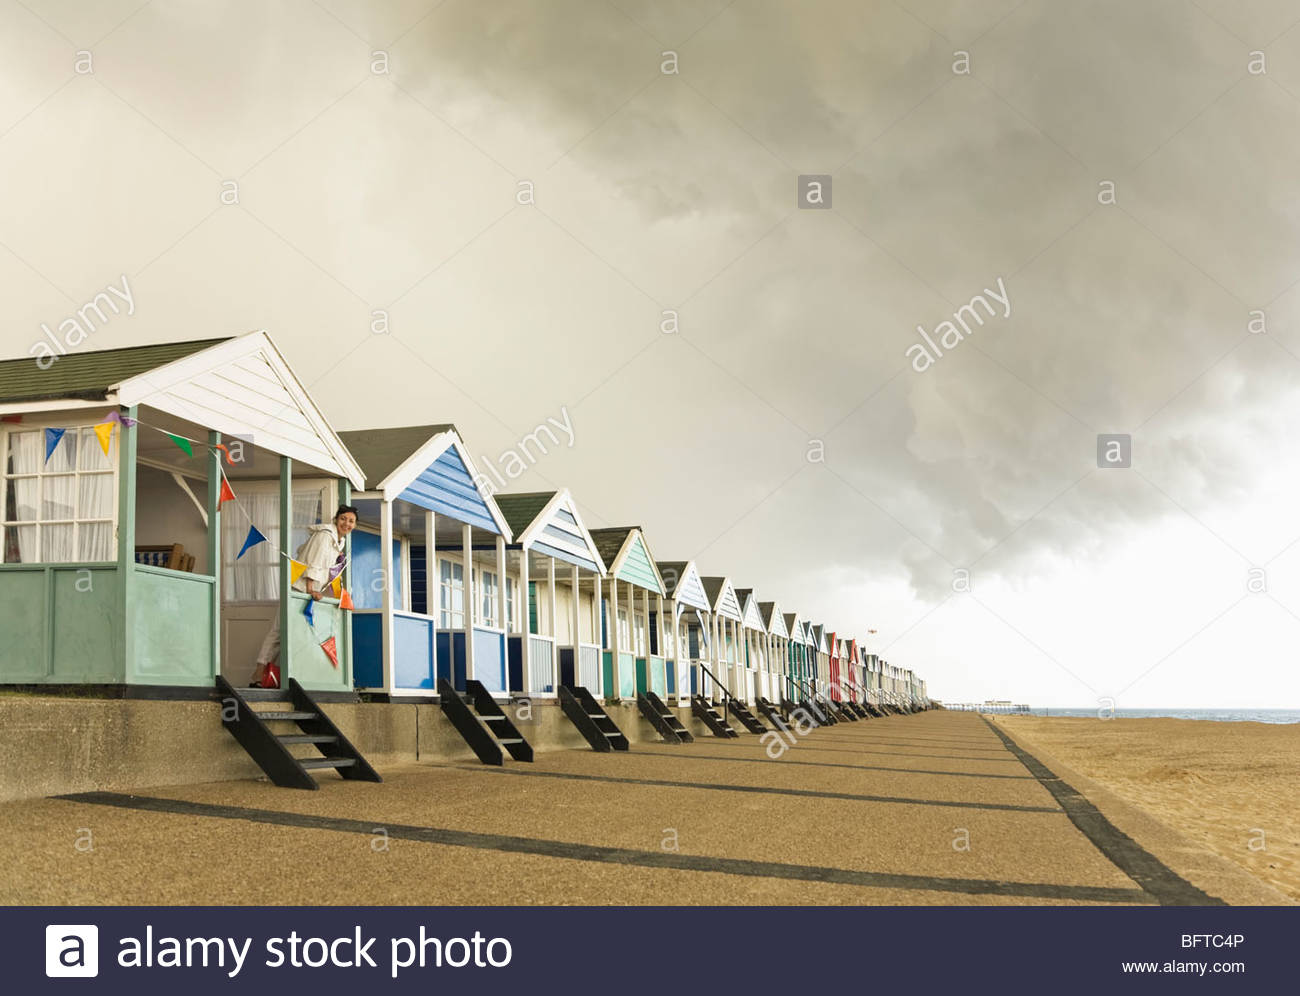 Taking shelter under Beach hut - Stock Image